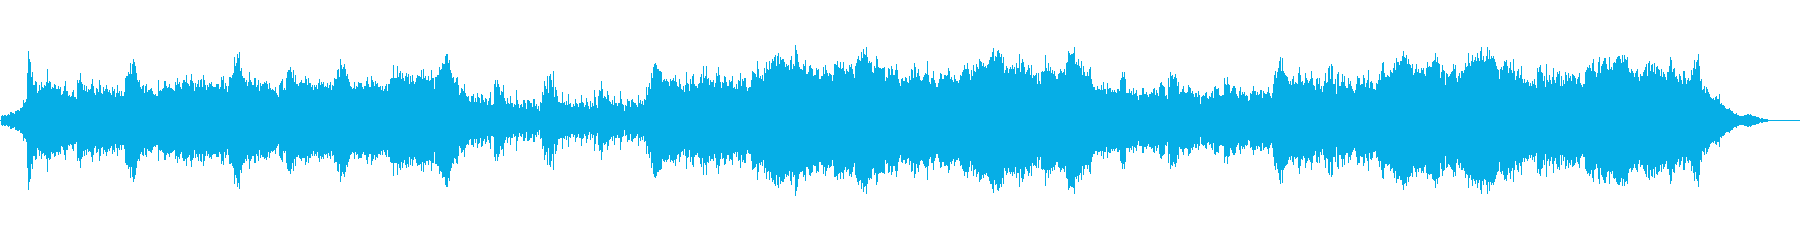 texture20の再生済みの波形